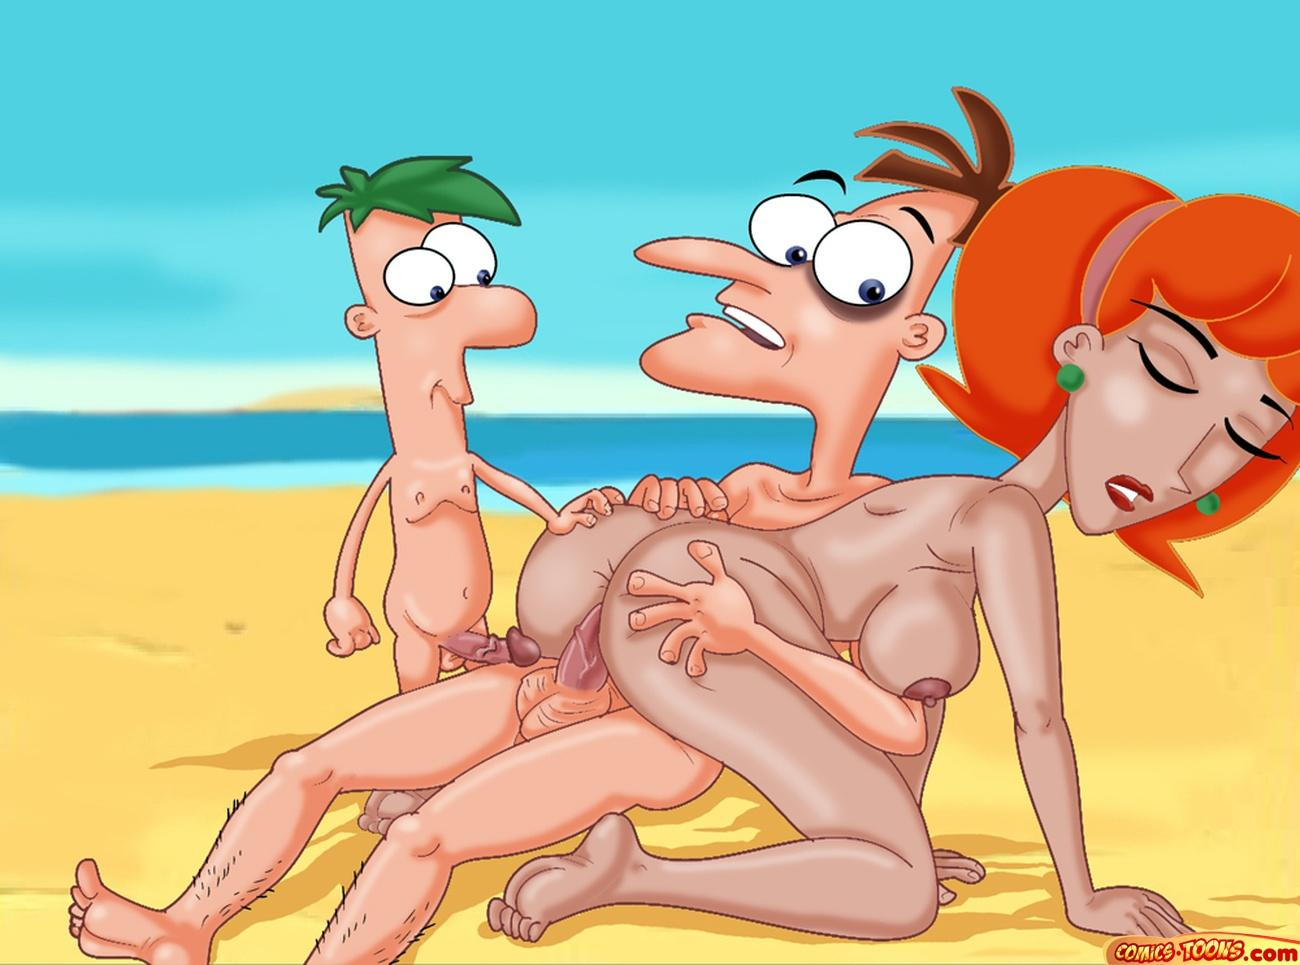 y phineas ferb porno comic Sitara watch dogs 2 nude